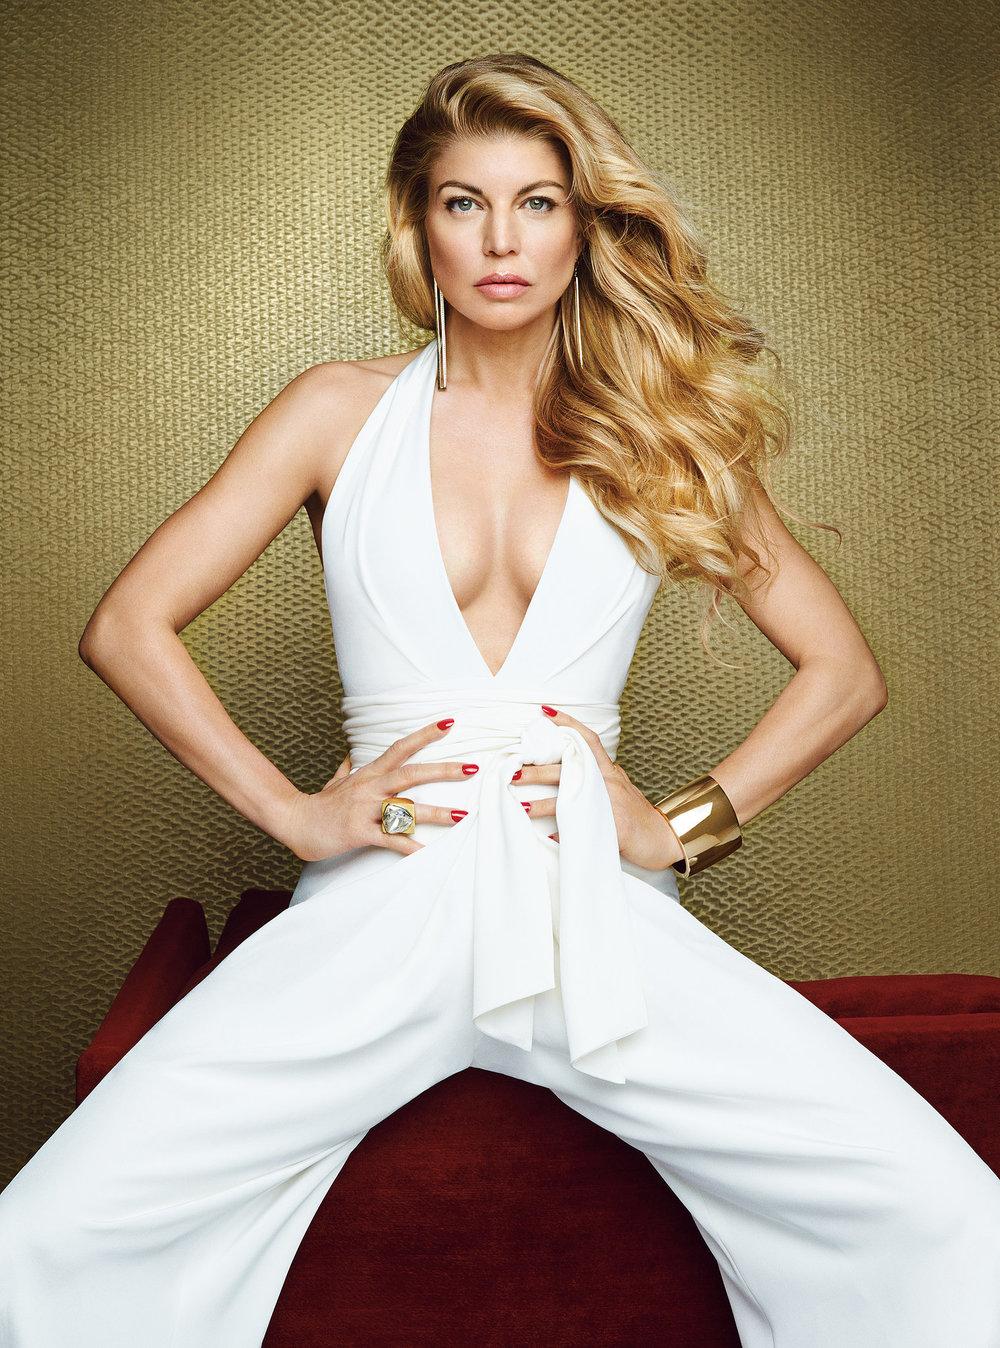 Fergie-Allure-Magazine-February-2015-Pictures3.jpg